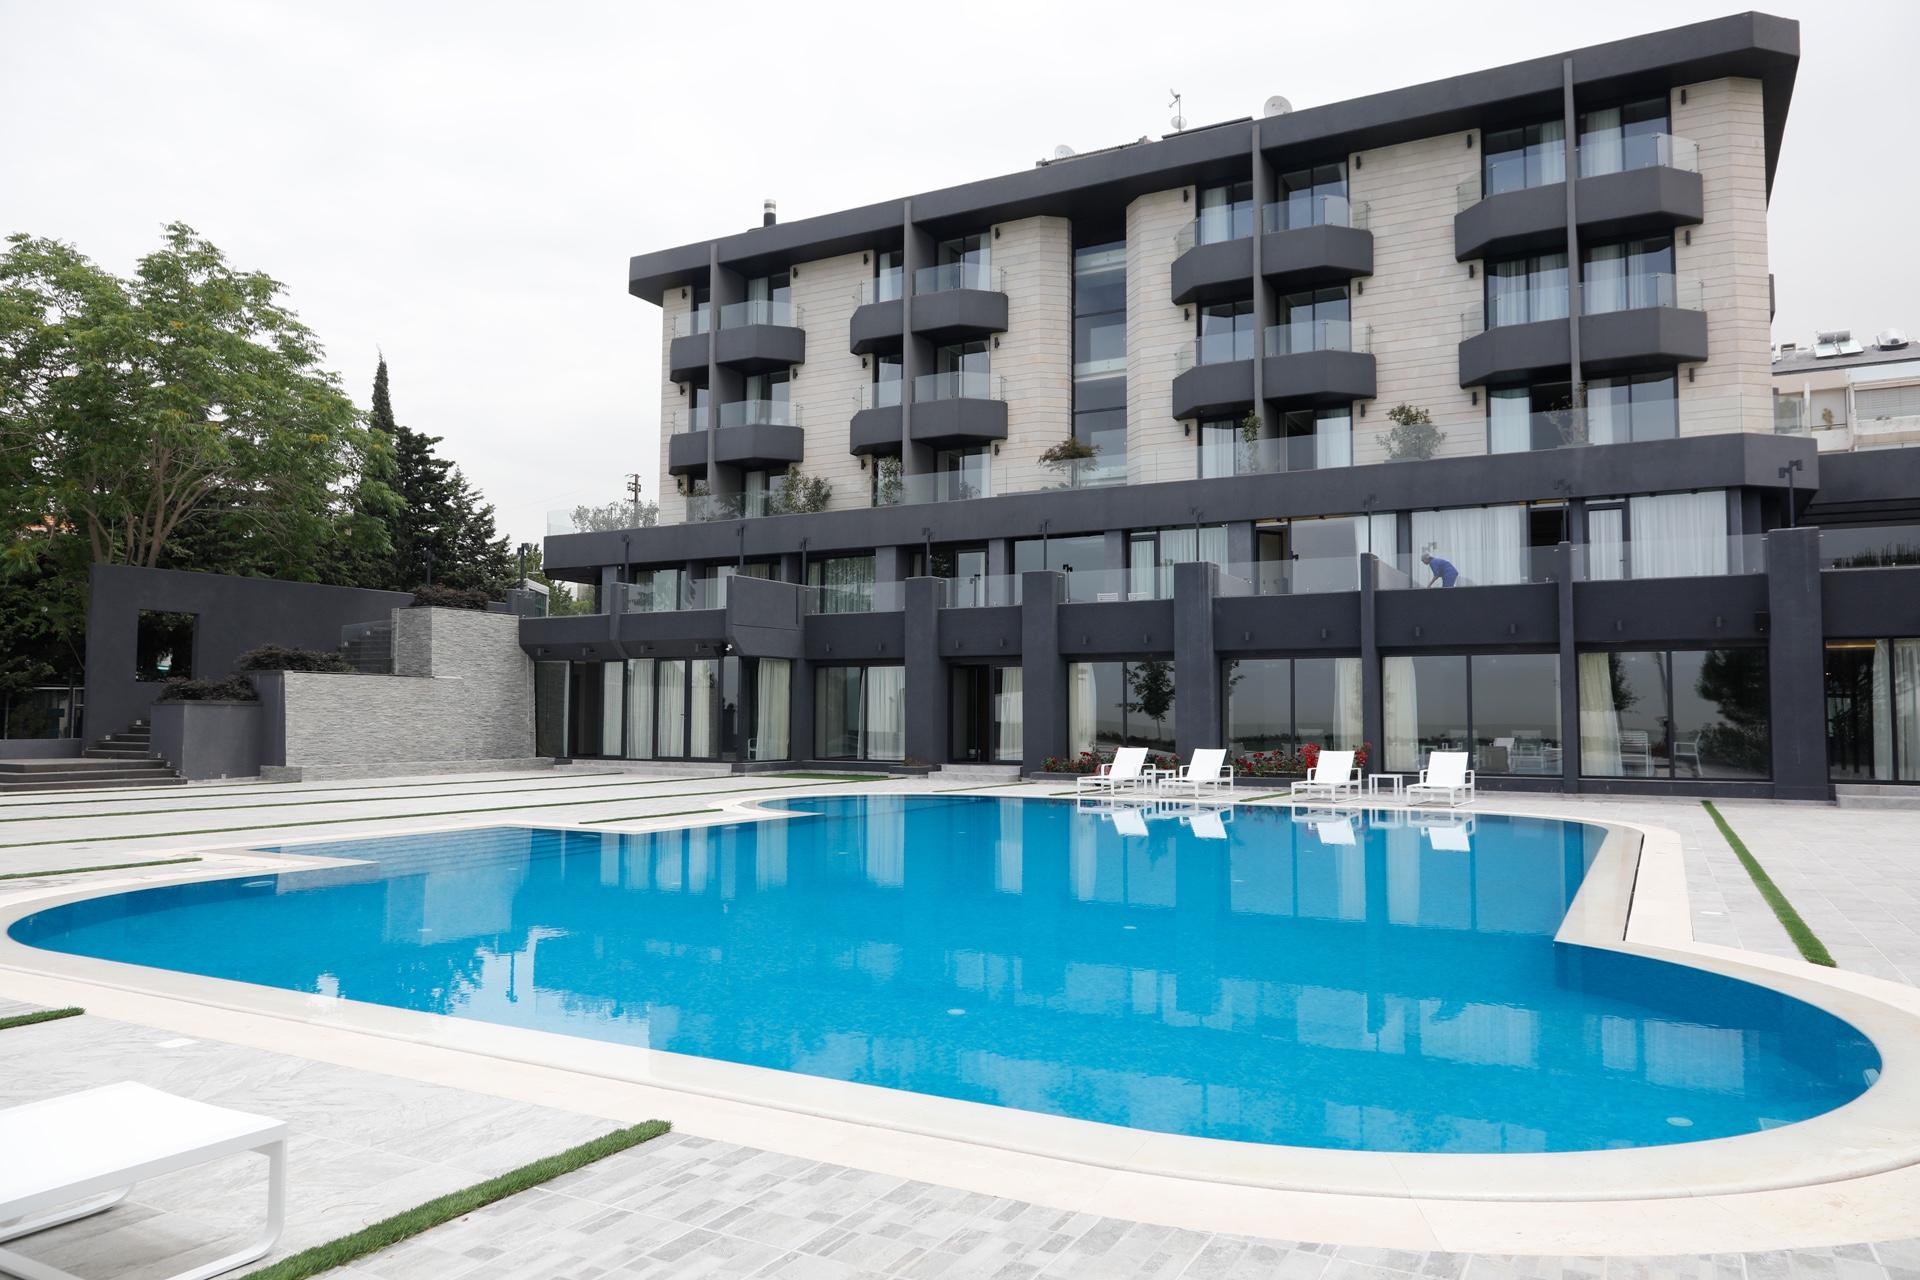 Le-Pave-Facilities-6